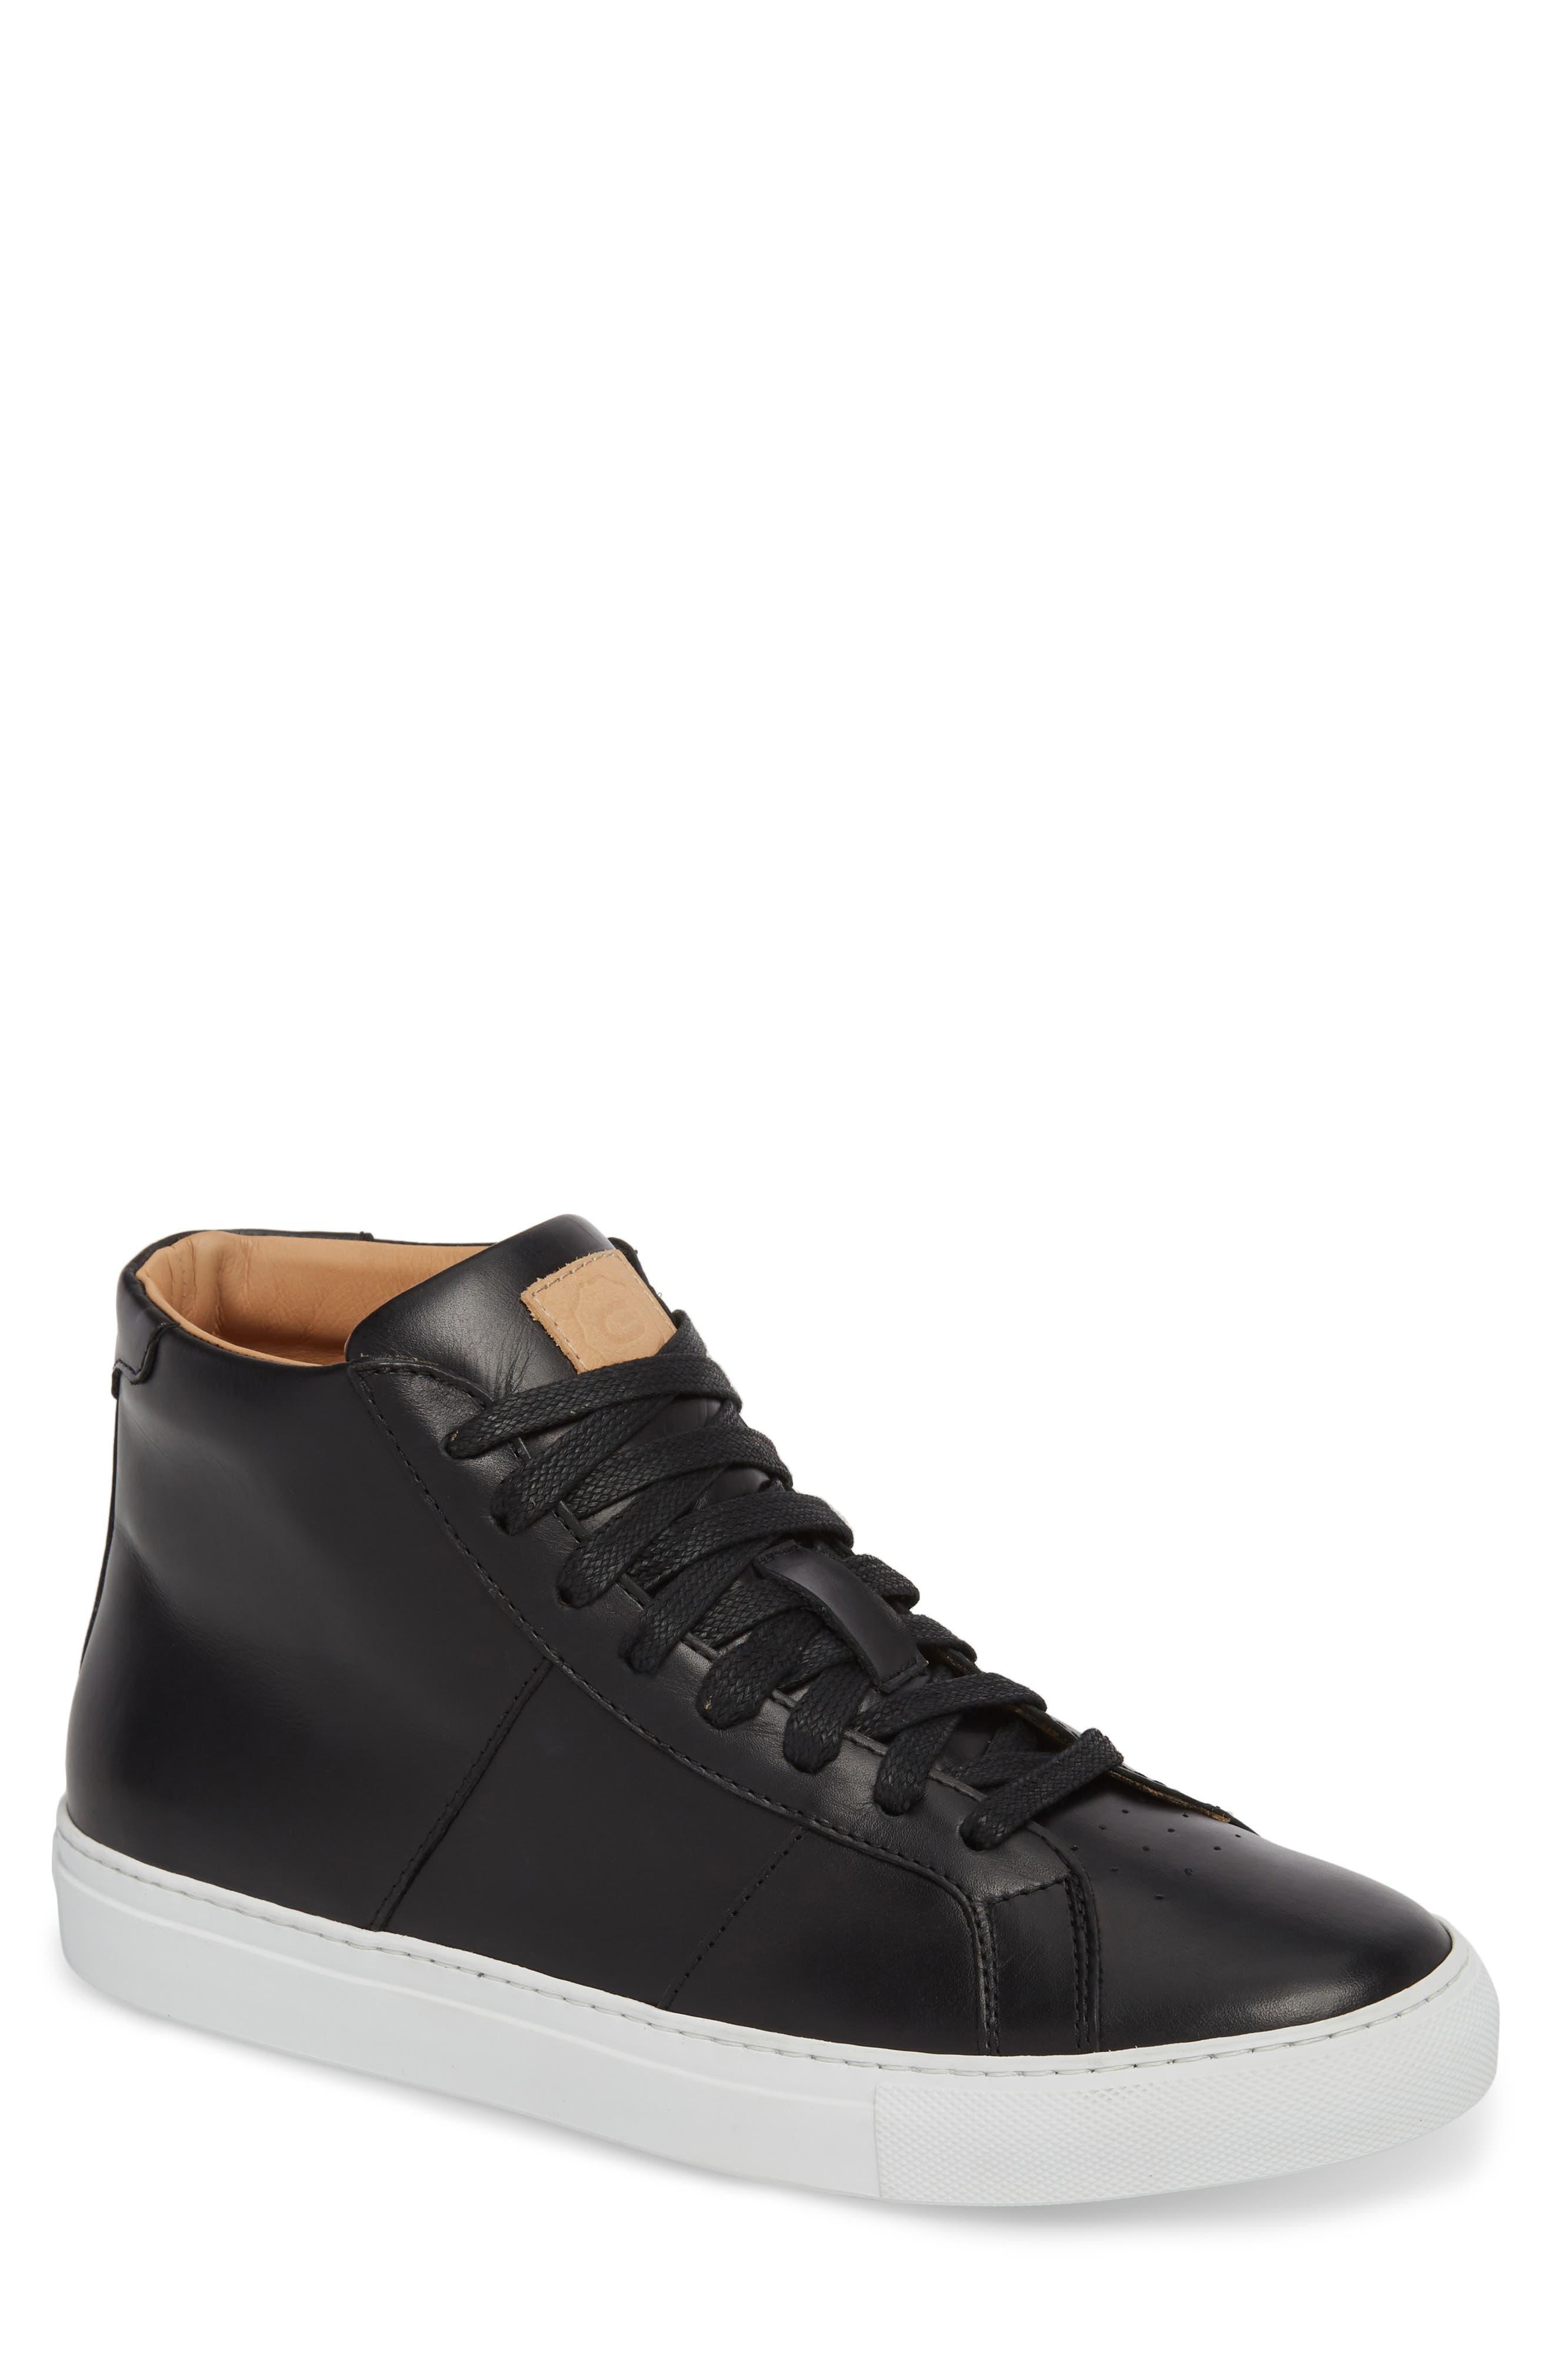 Greats Royale High Top Sneaker (Men)